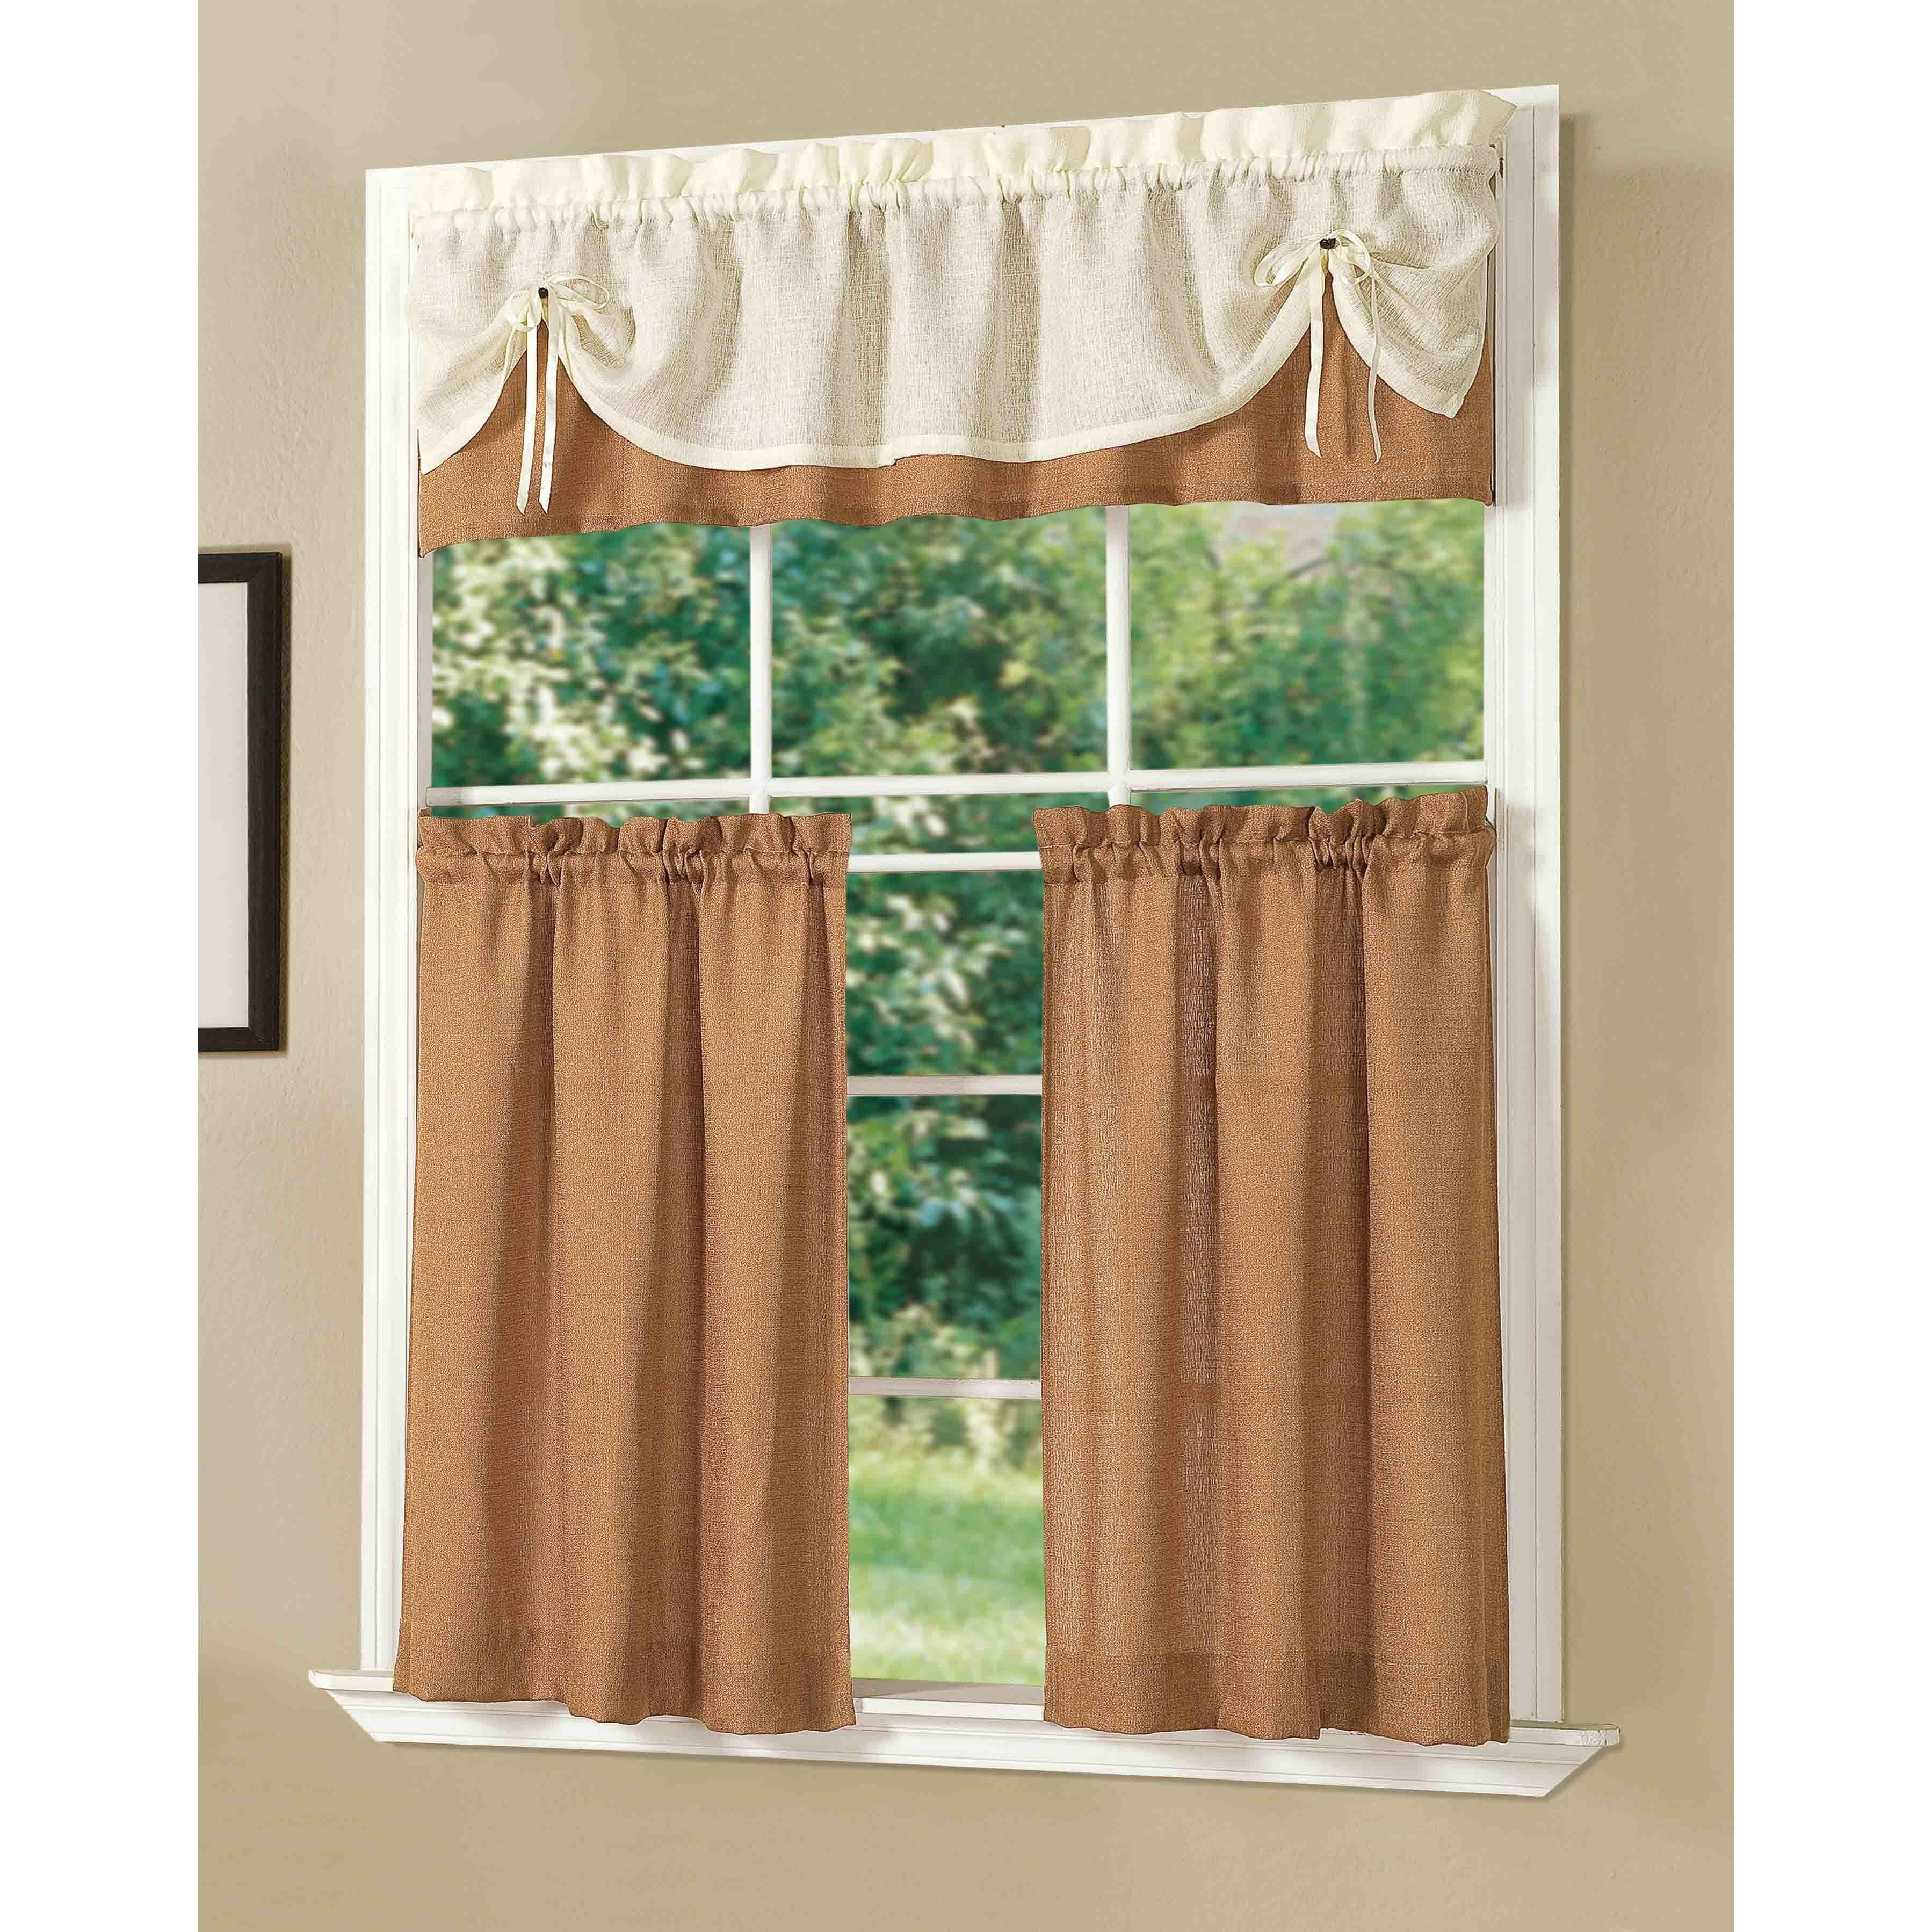 Dainty Home Kitchen Sunrise Curtain Set & Reviews